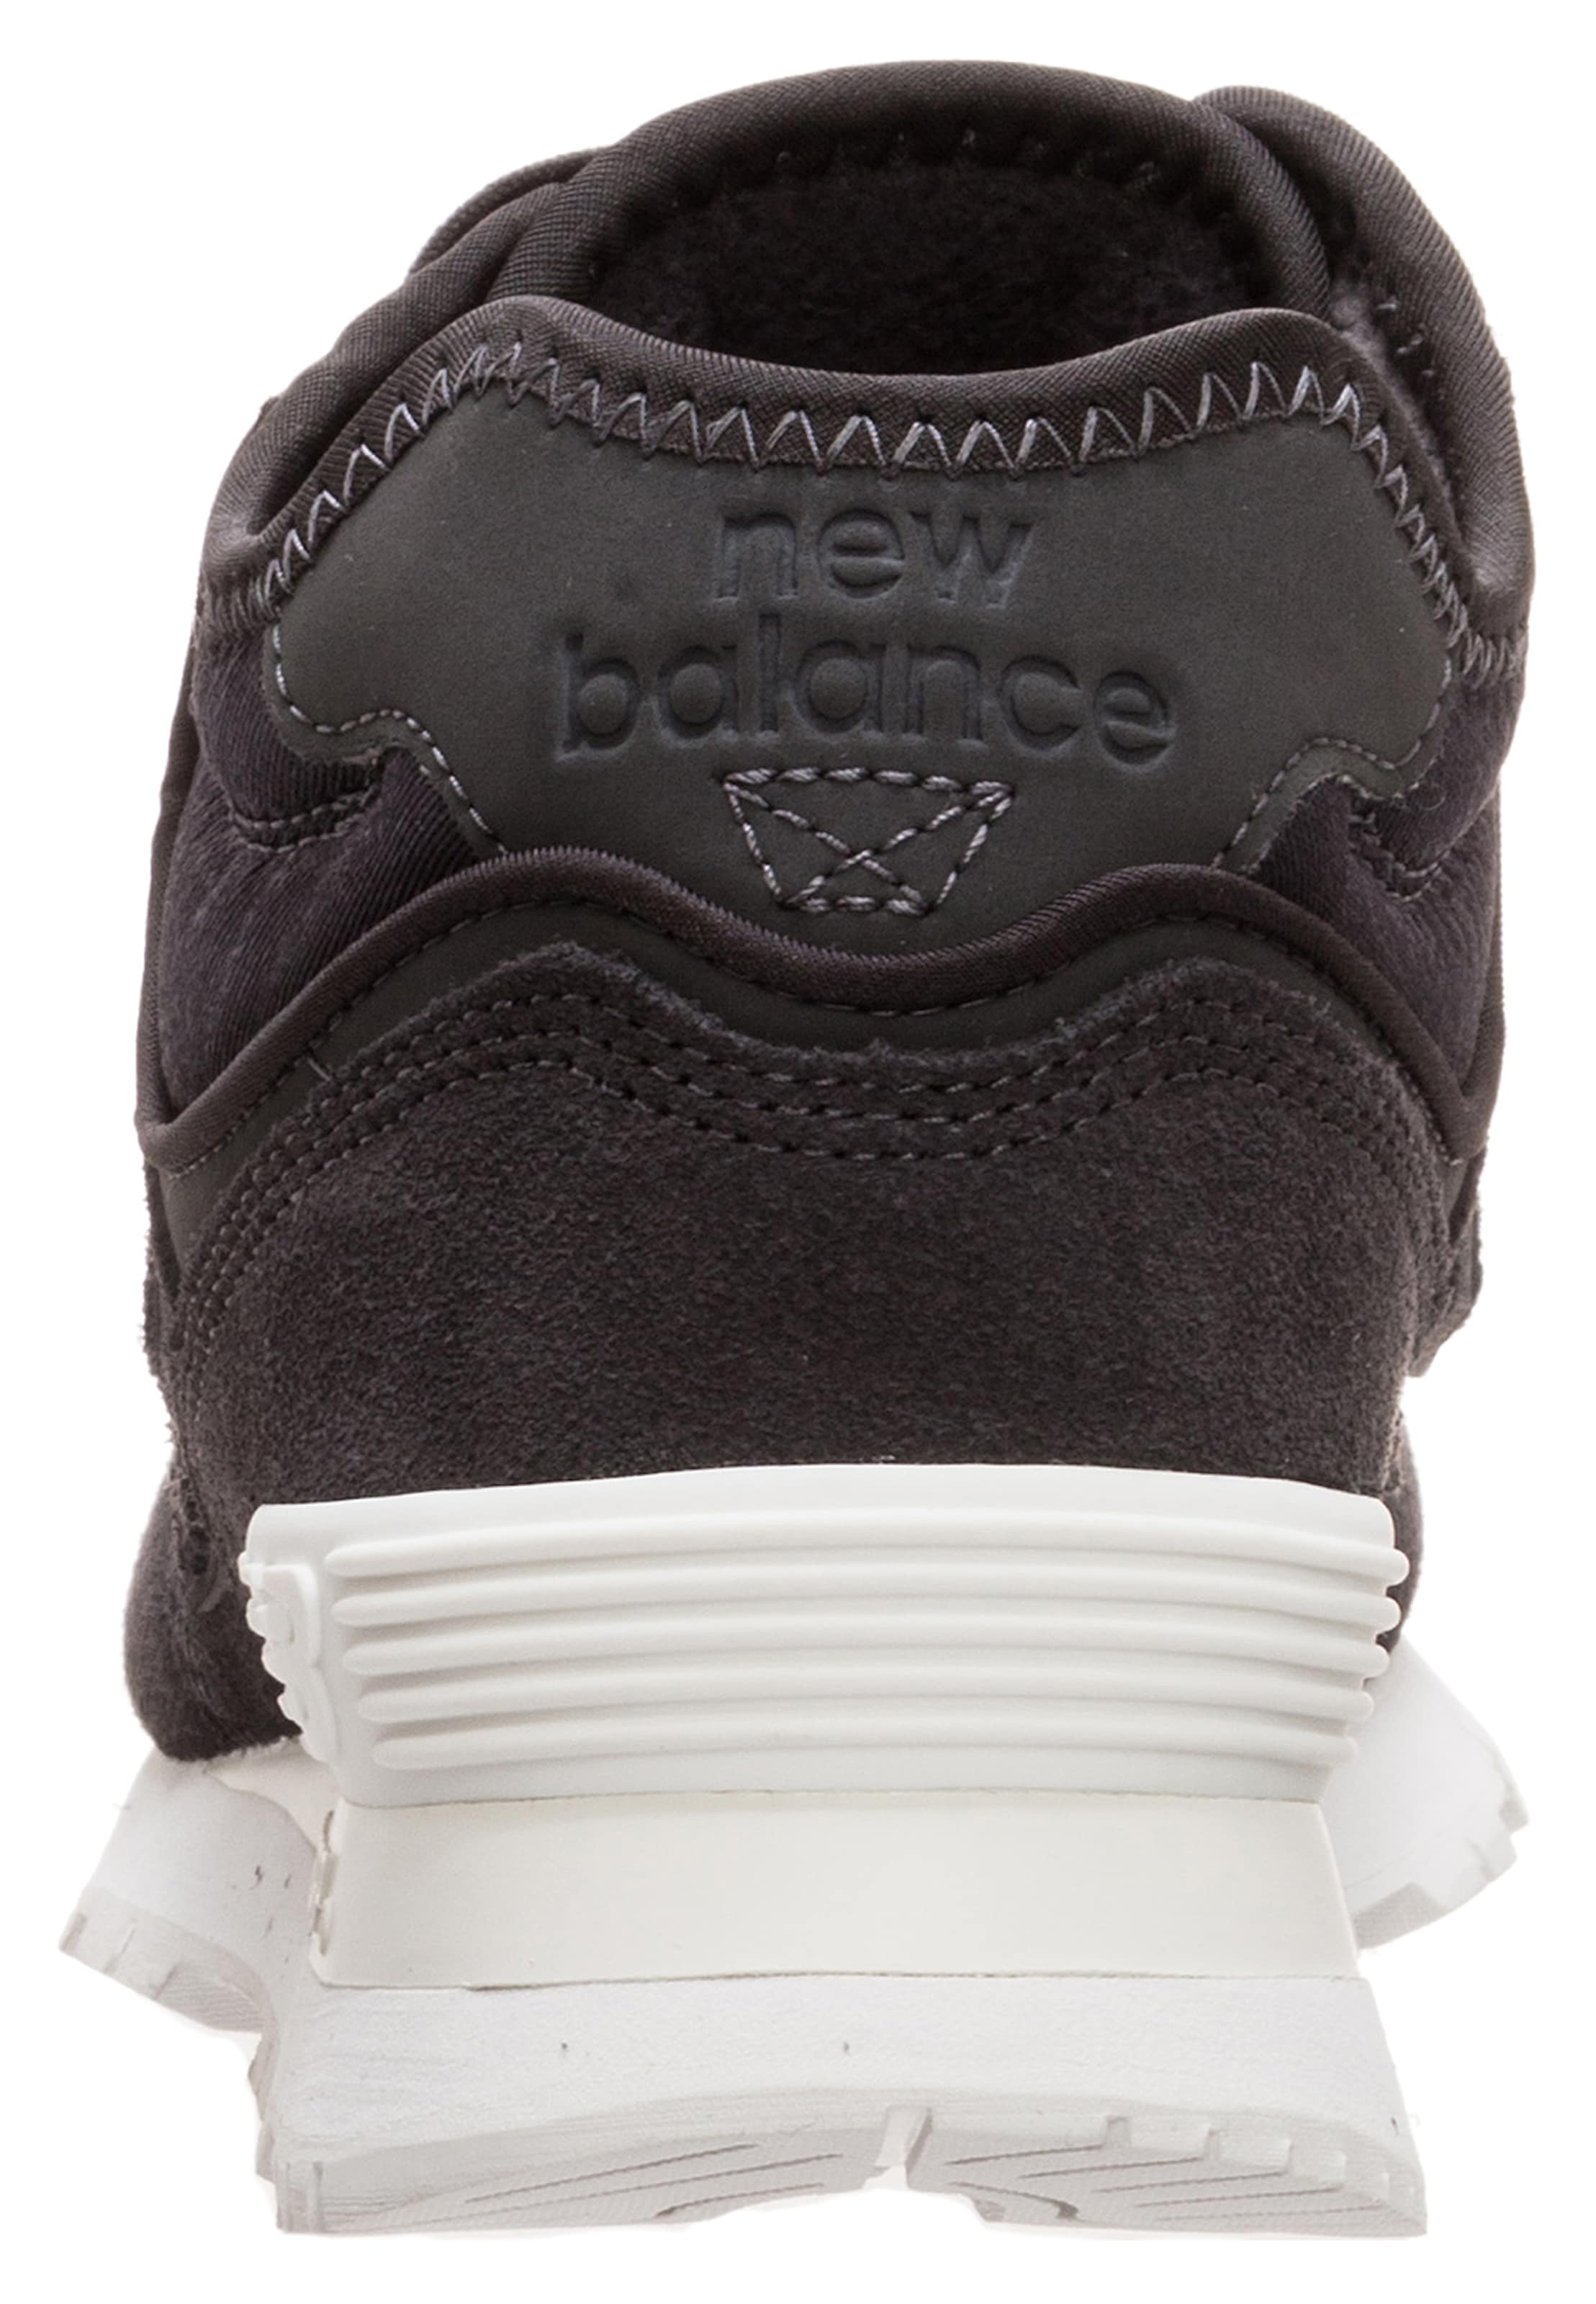 New Balance En bb Basses Baskets AnthraciteBlanc 'wh574 b' Rqc34jL5A